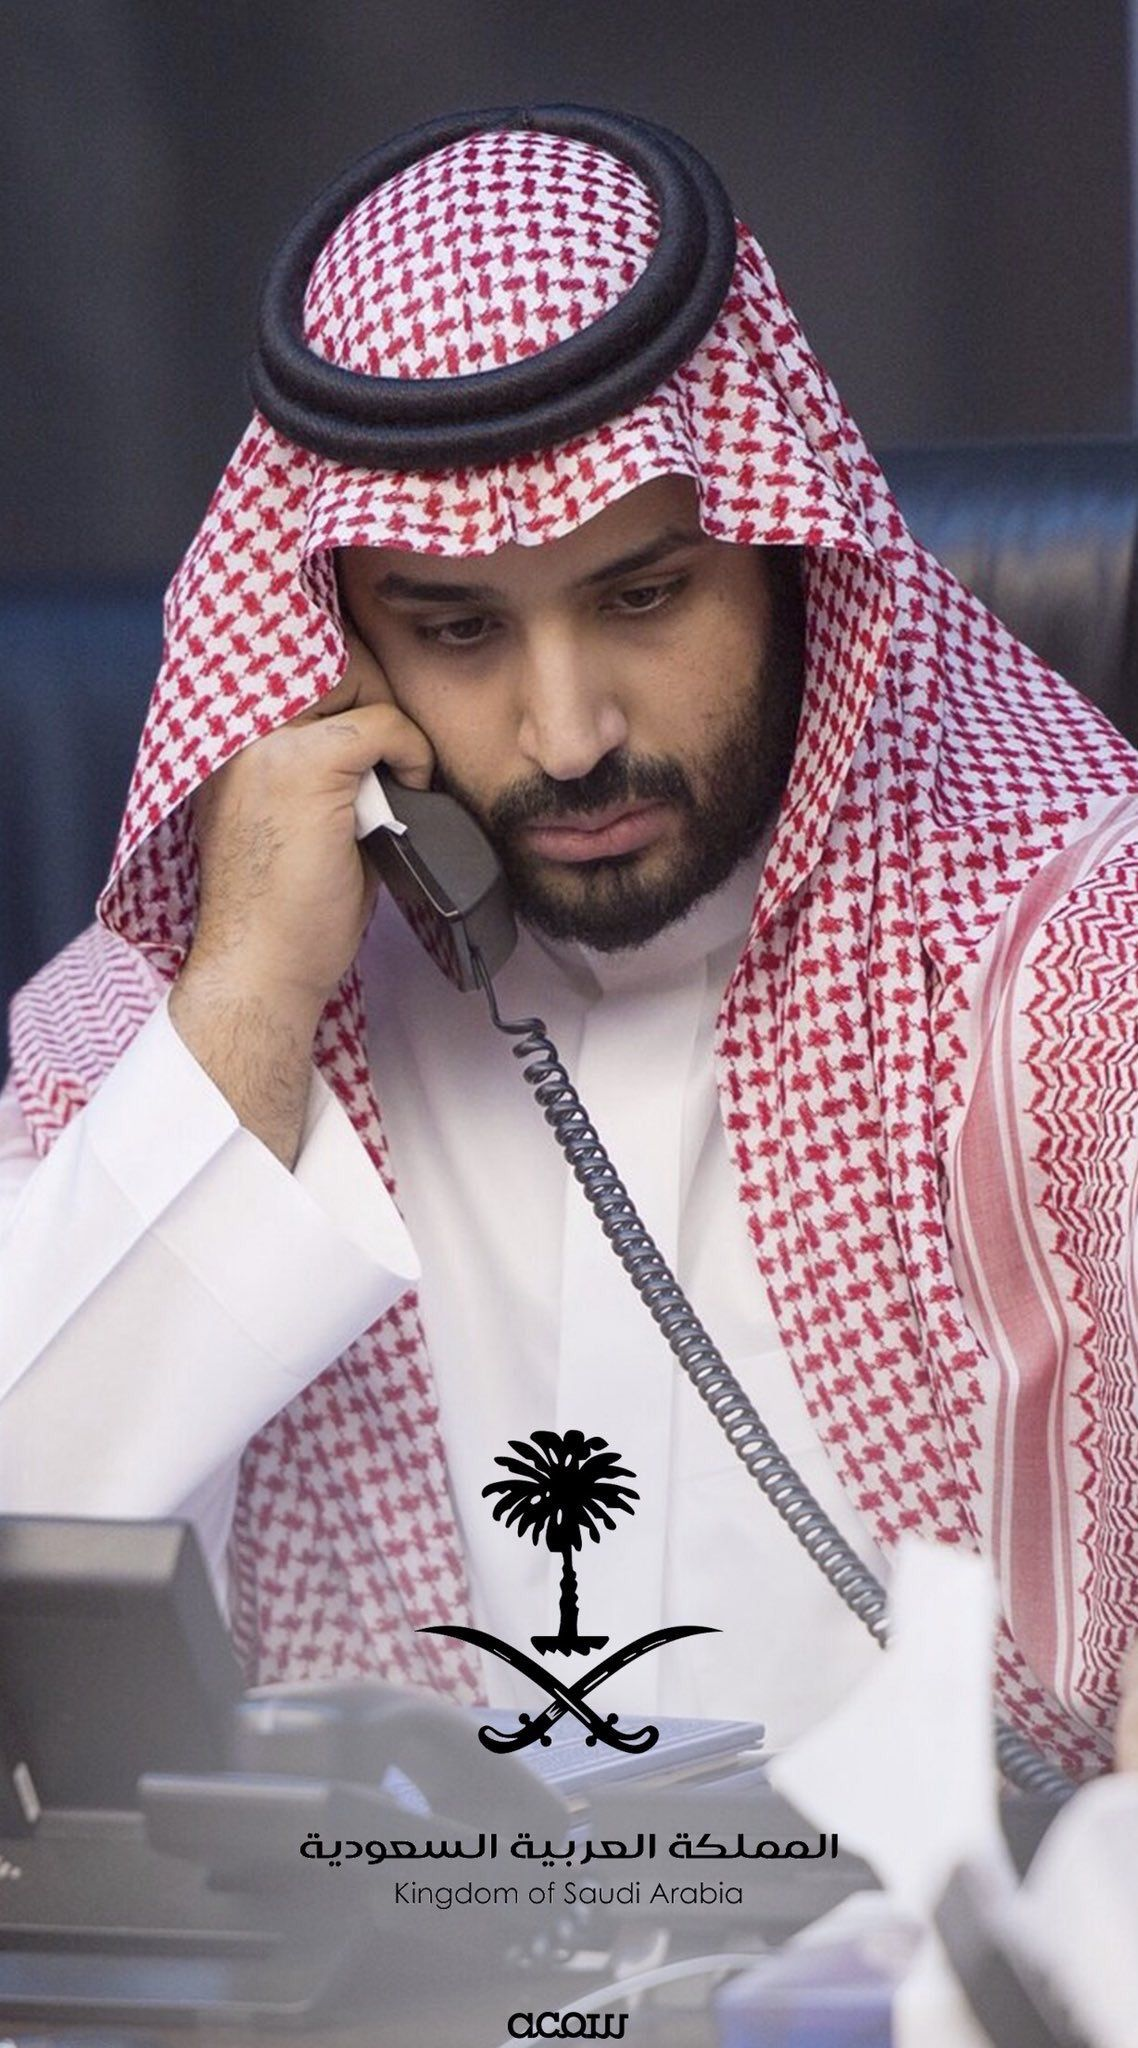 Pin By Nada Nasser On خلفيات Ksa Saudi Arabia Handsome Arab Men Prince Mohammed